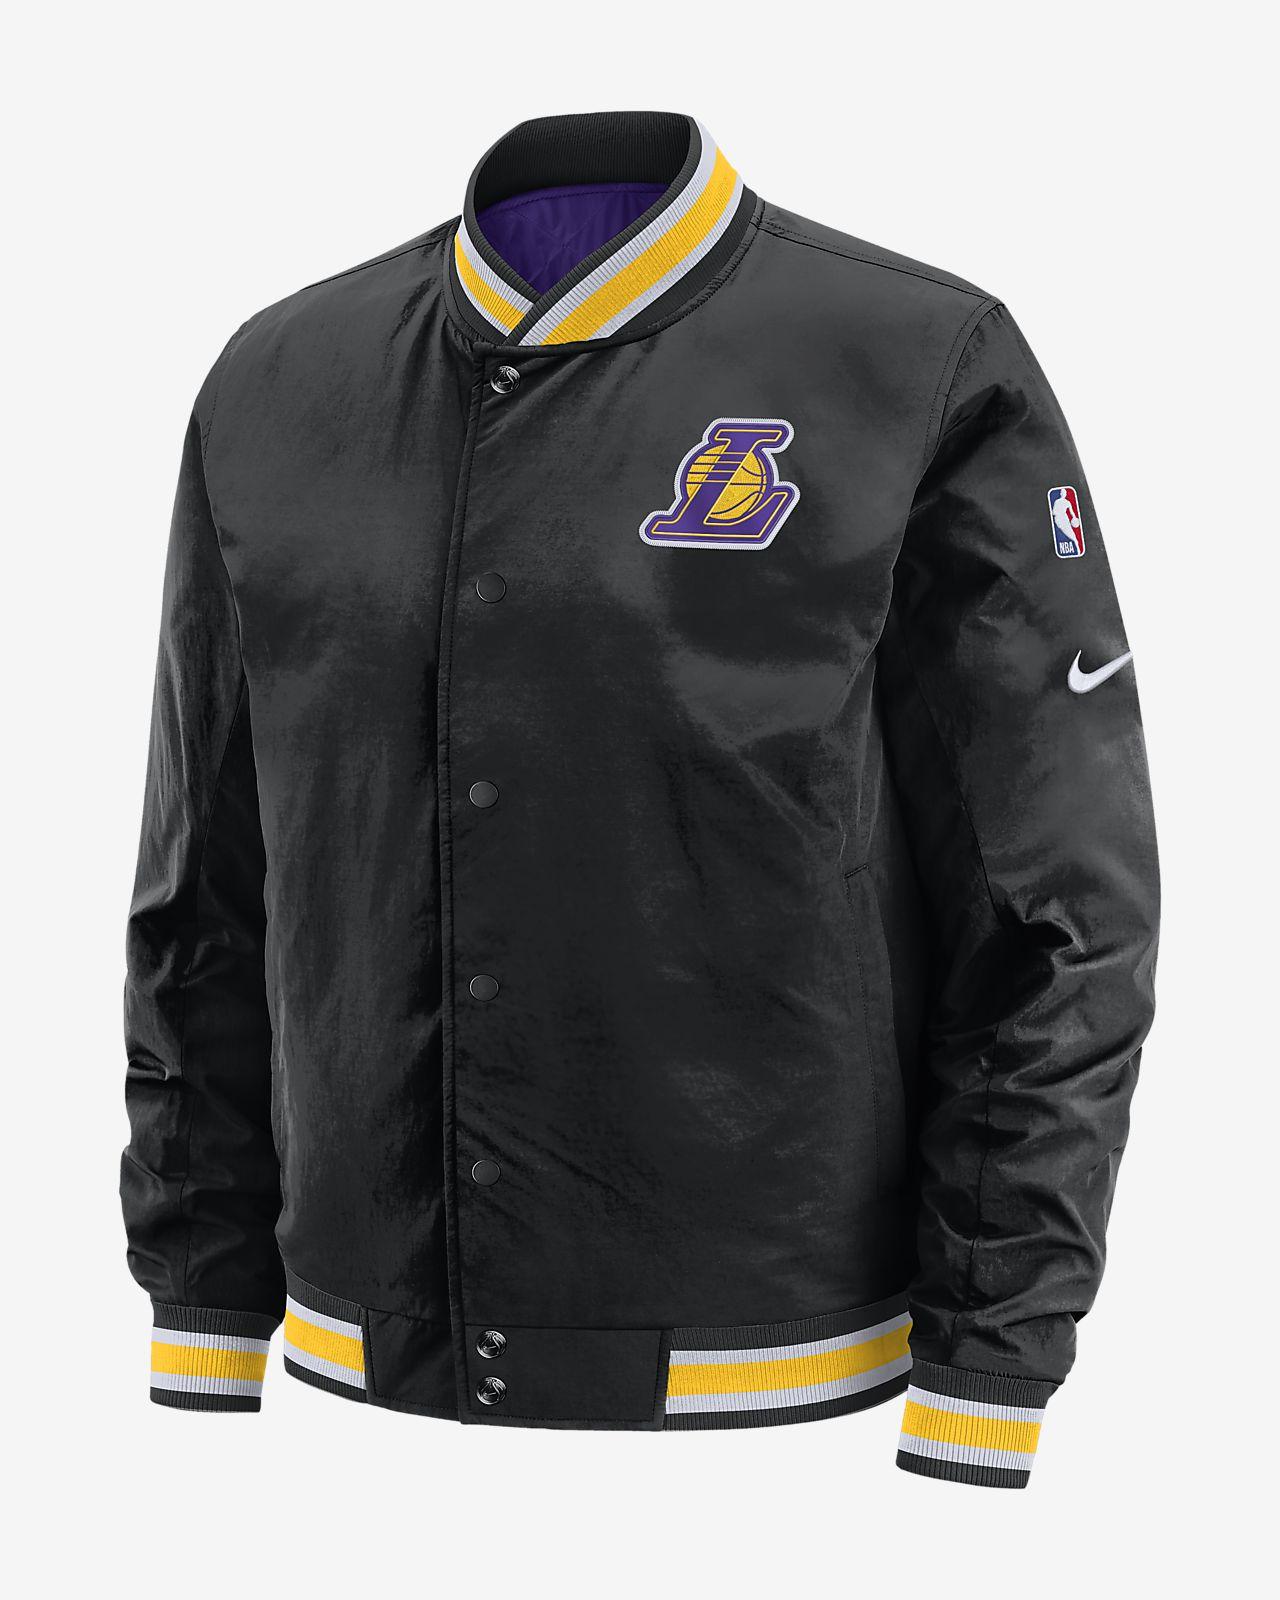 Los Angeles Lakers Courtside vendbar Nike NBA-jakke til herre